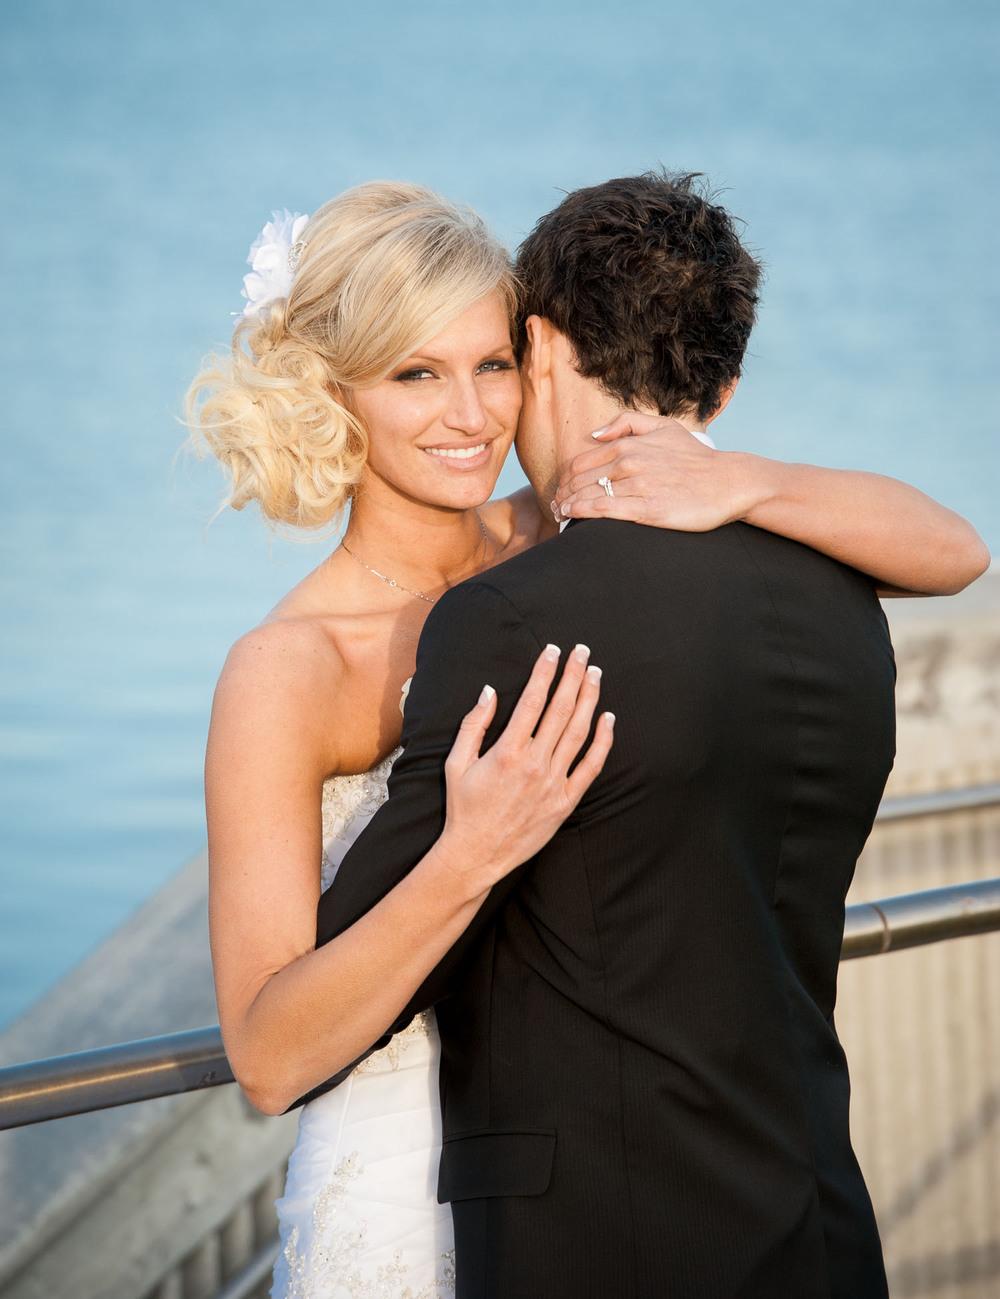 stewart_bertrand_wedding_photography_smblogwed-1003.jpg